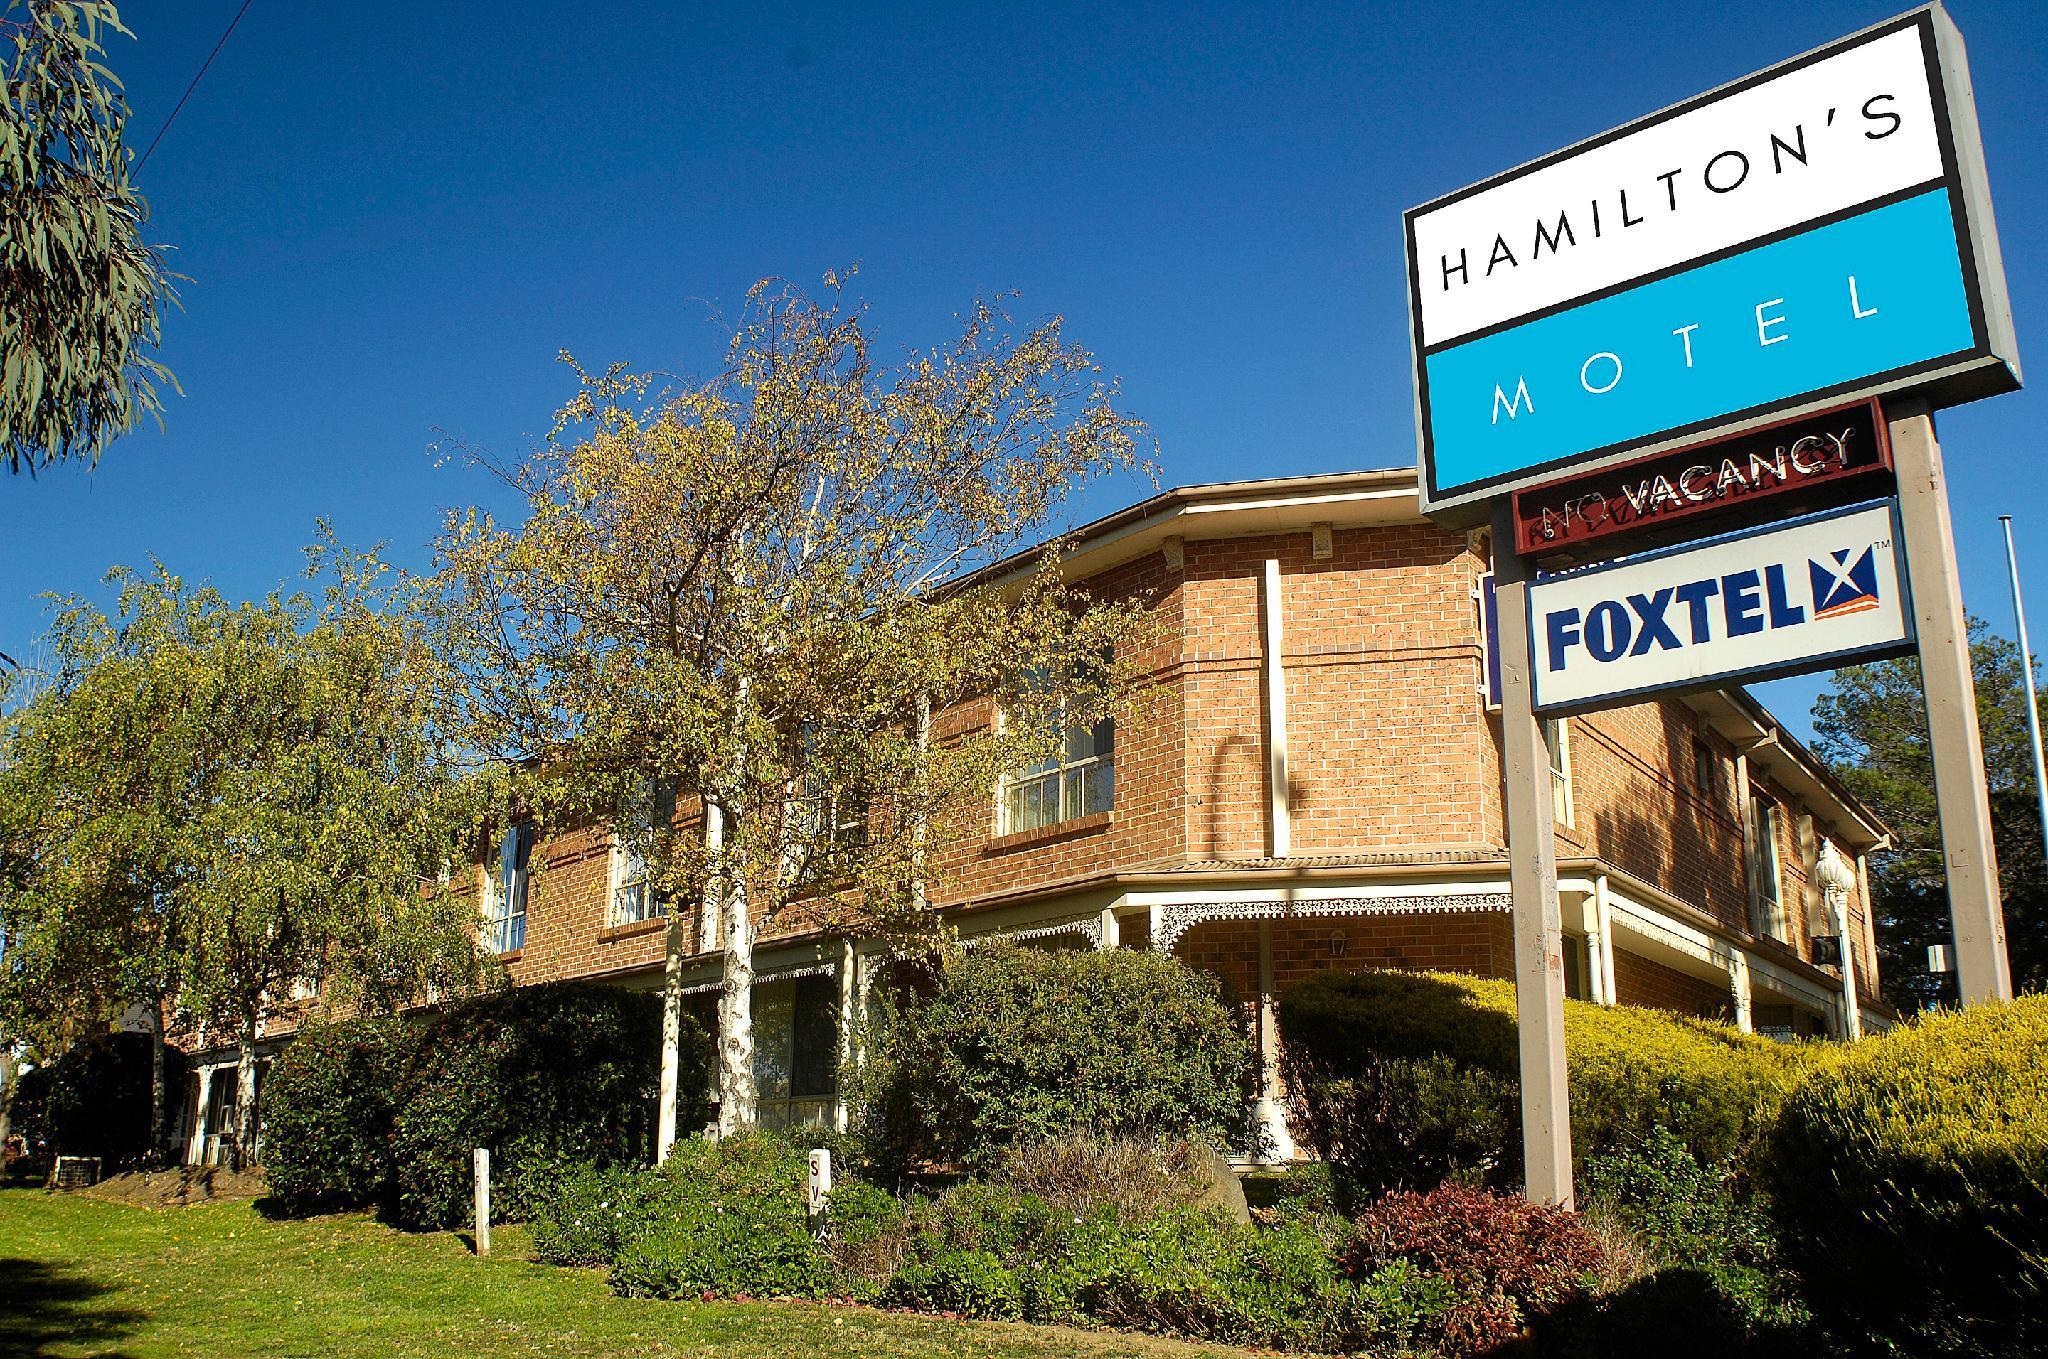 Hamiltons Queanbeyan Motel